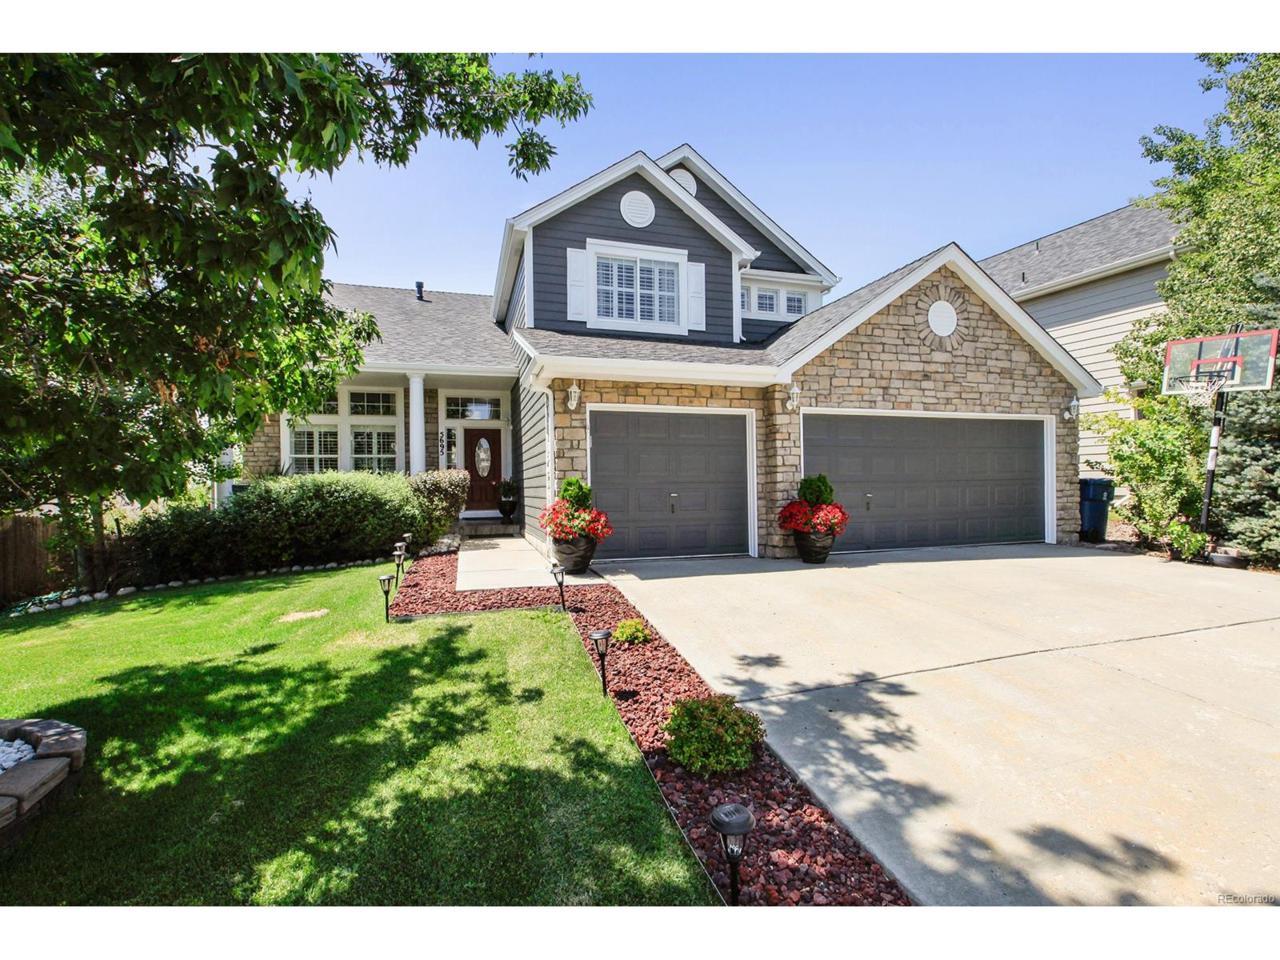 5695 S Shawnee Street, Aurora, CO 80015 (MLS #1896540) :: 8z Real Estate